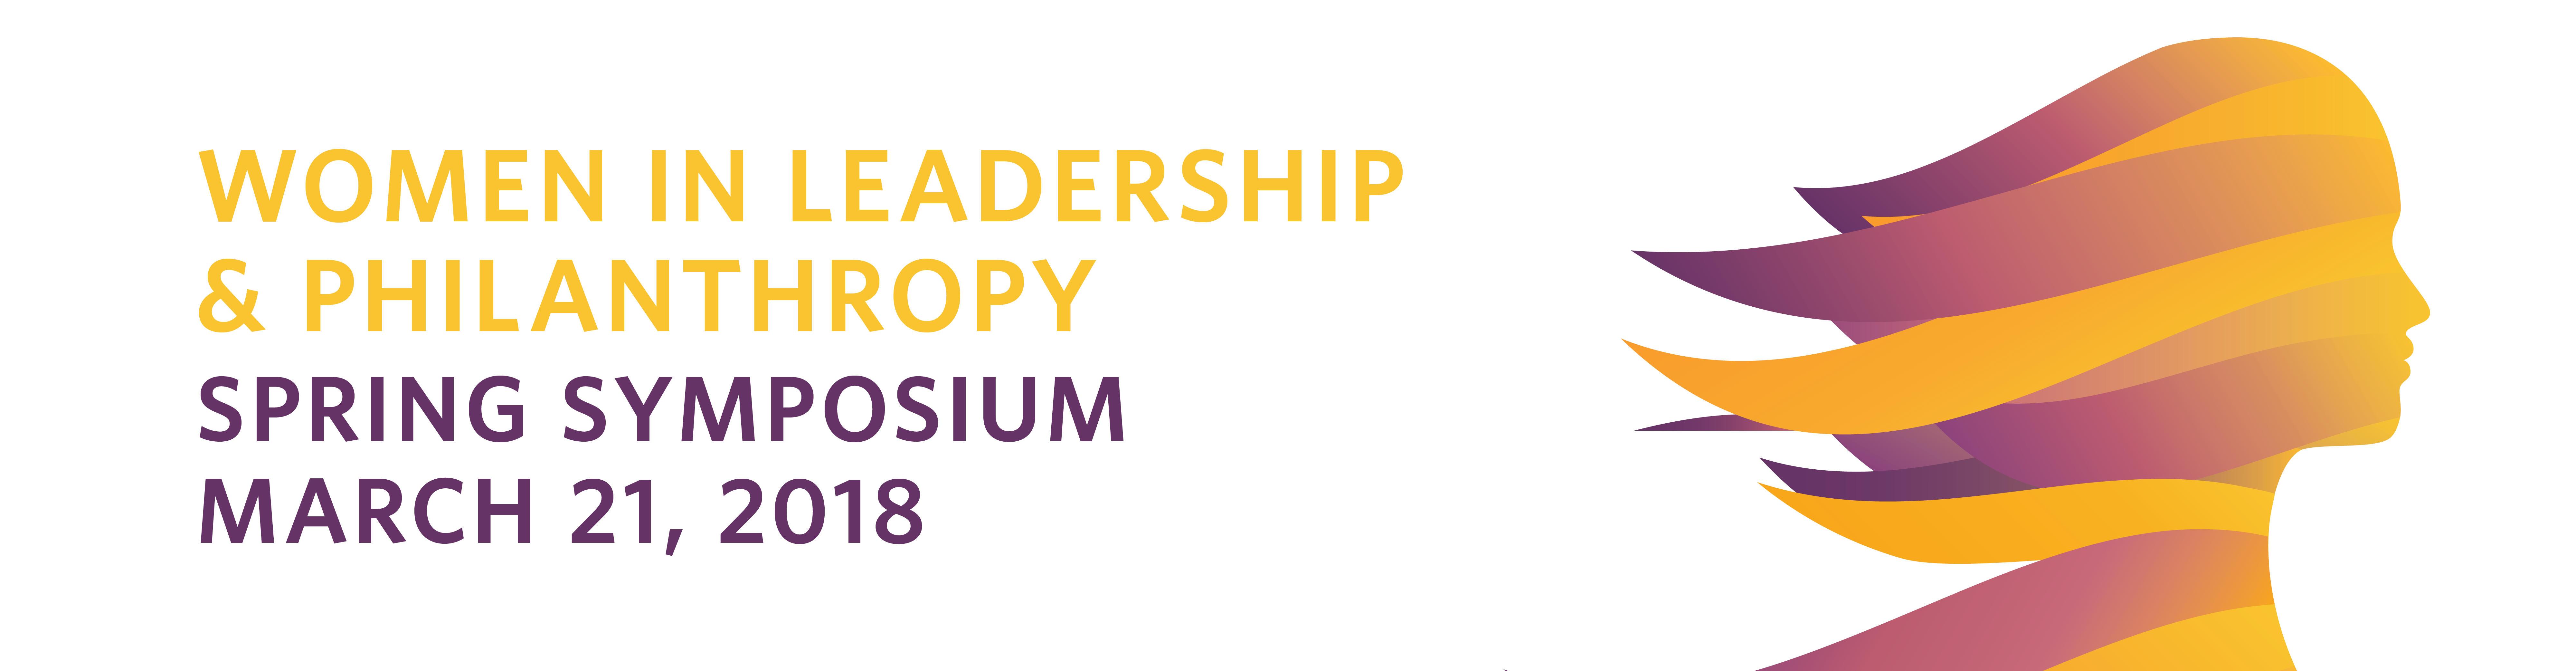 2018 Women in Leadership & Philanthropy Spring Symposium